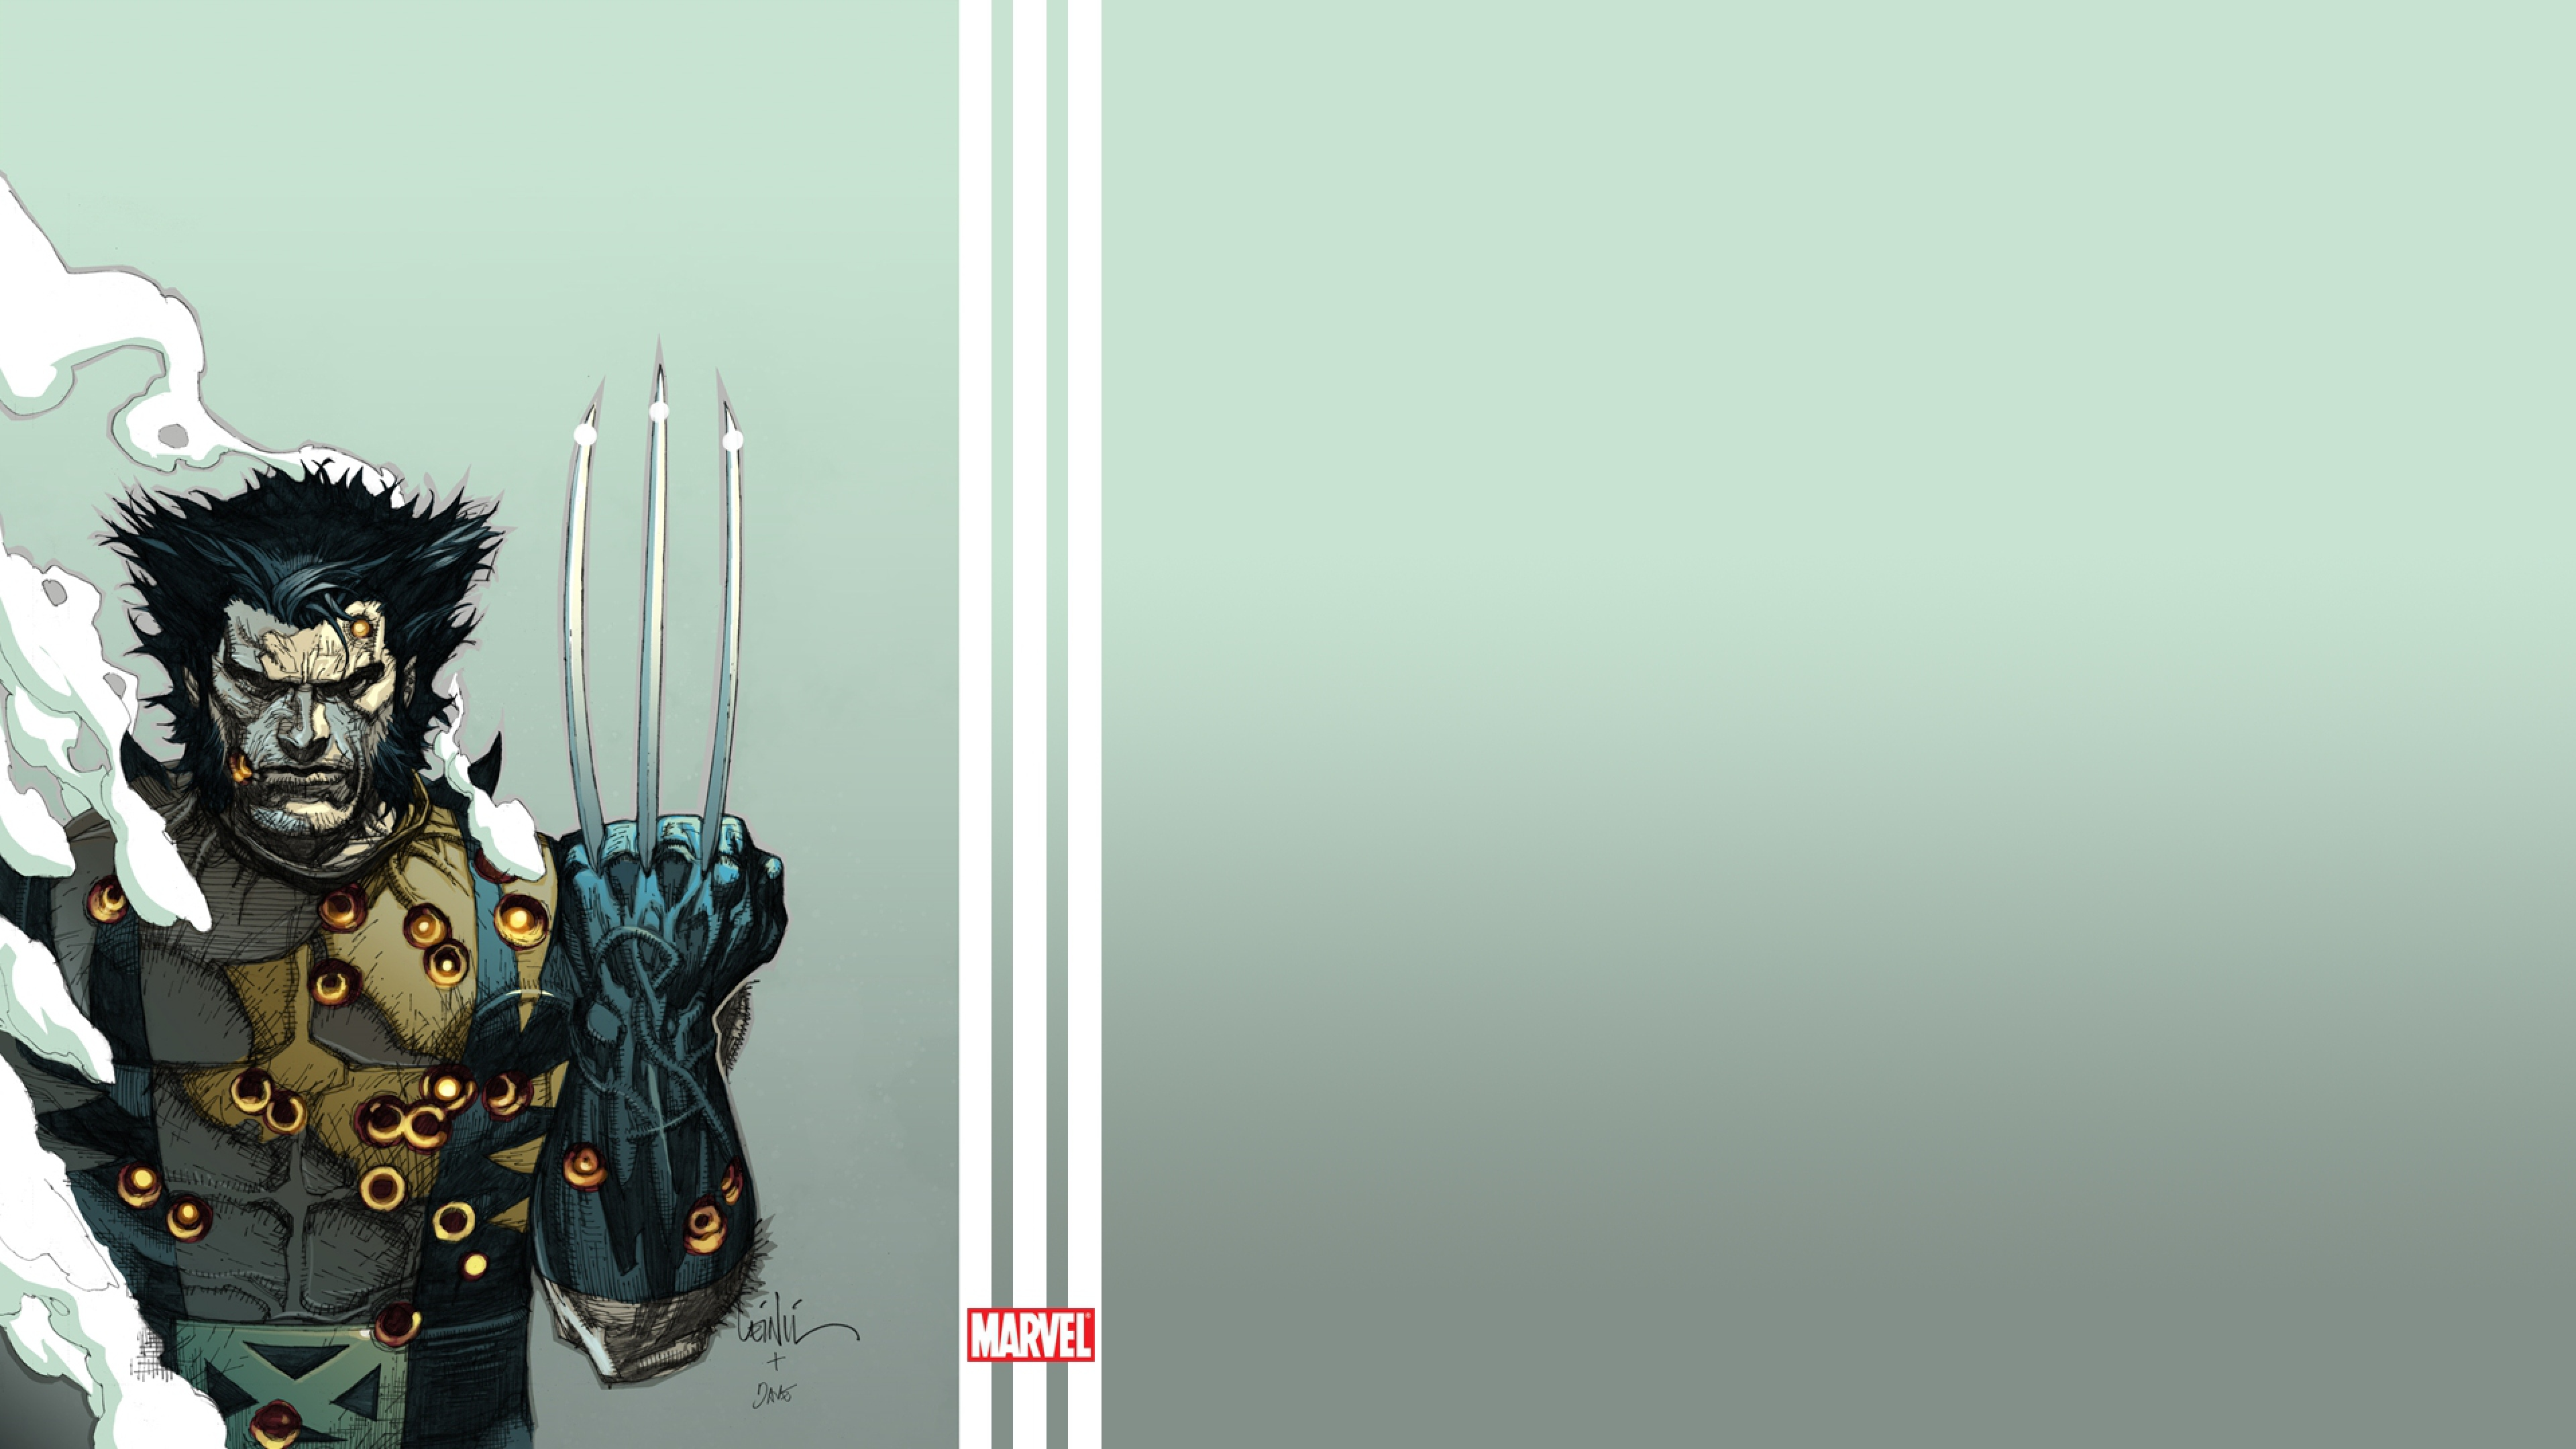 incredible hulk Marvel comics Art Wallpaper Background 4K Ultra HD 3840x2160